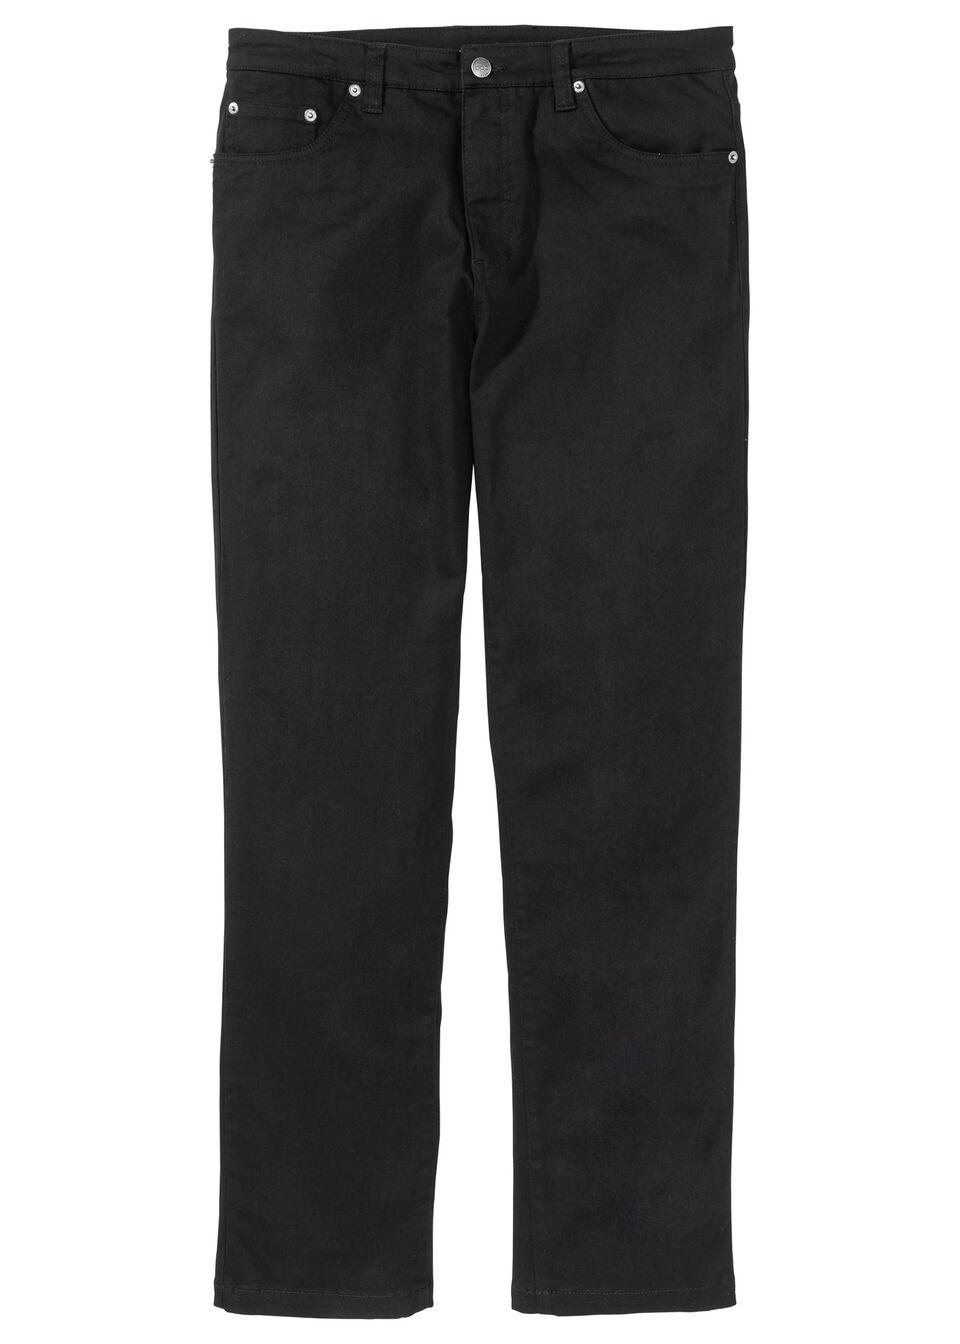 Pantaloni Classic Fit cu stretch, drepţi bonprix